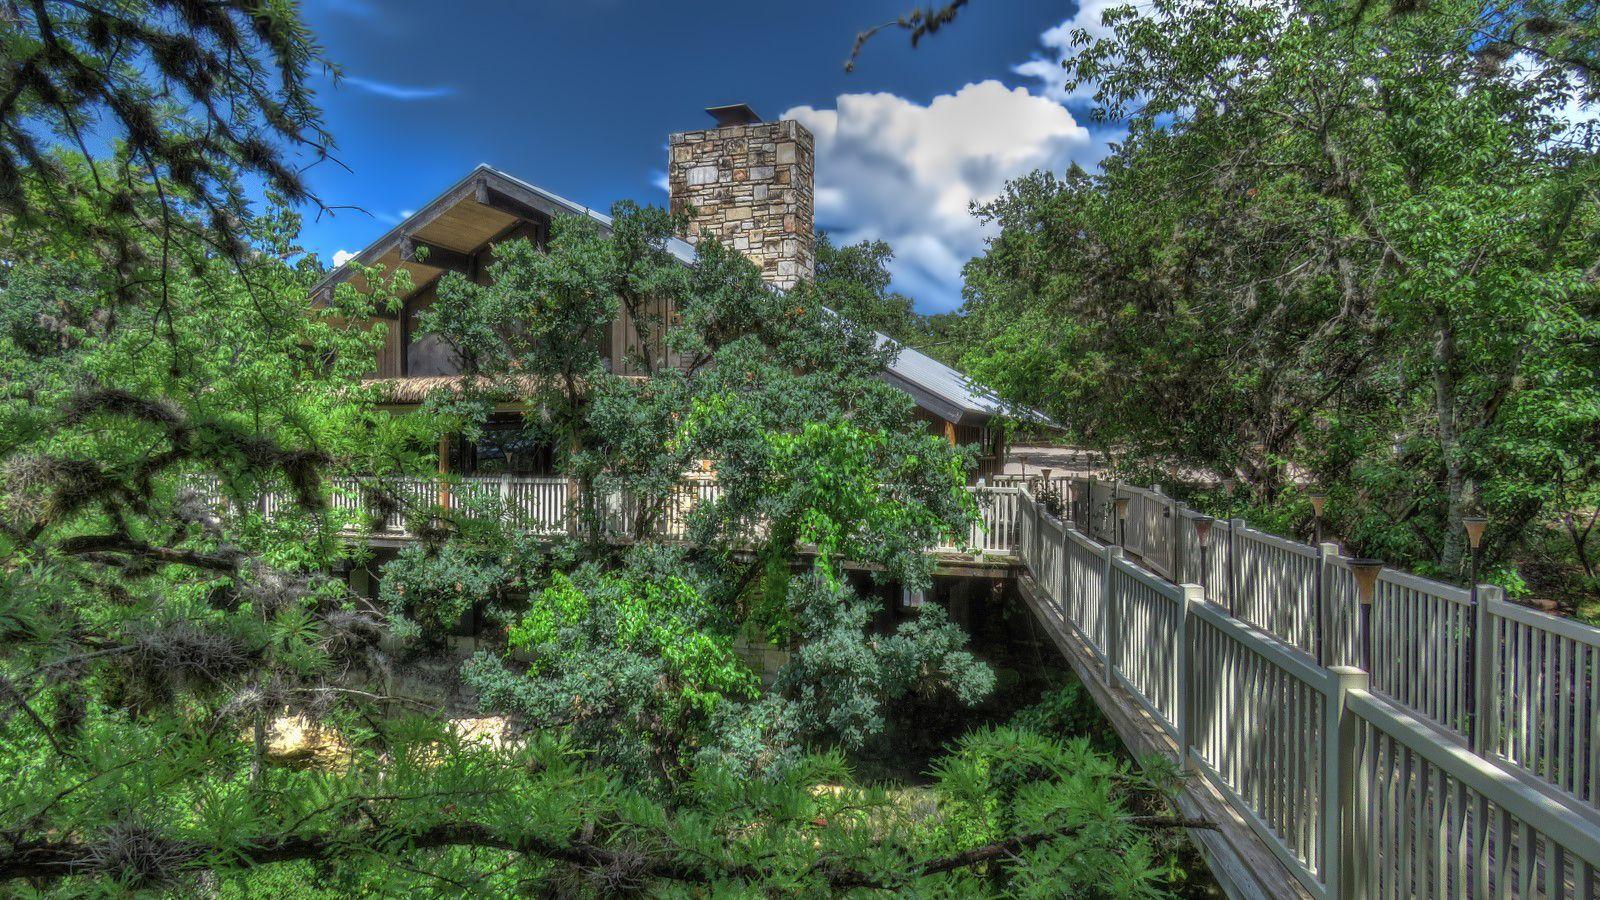 tx season treehouse river cabins rio texas frio nelson episodes